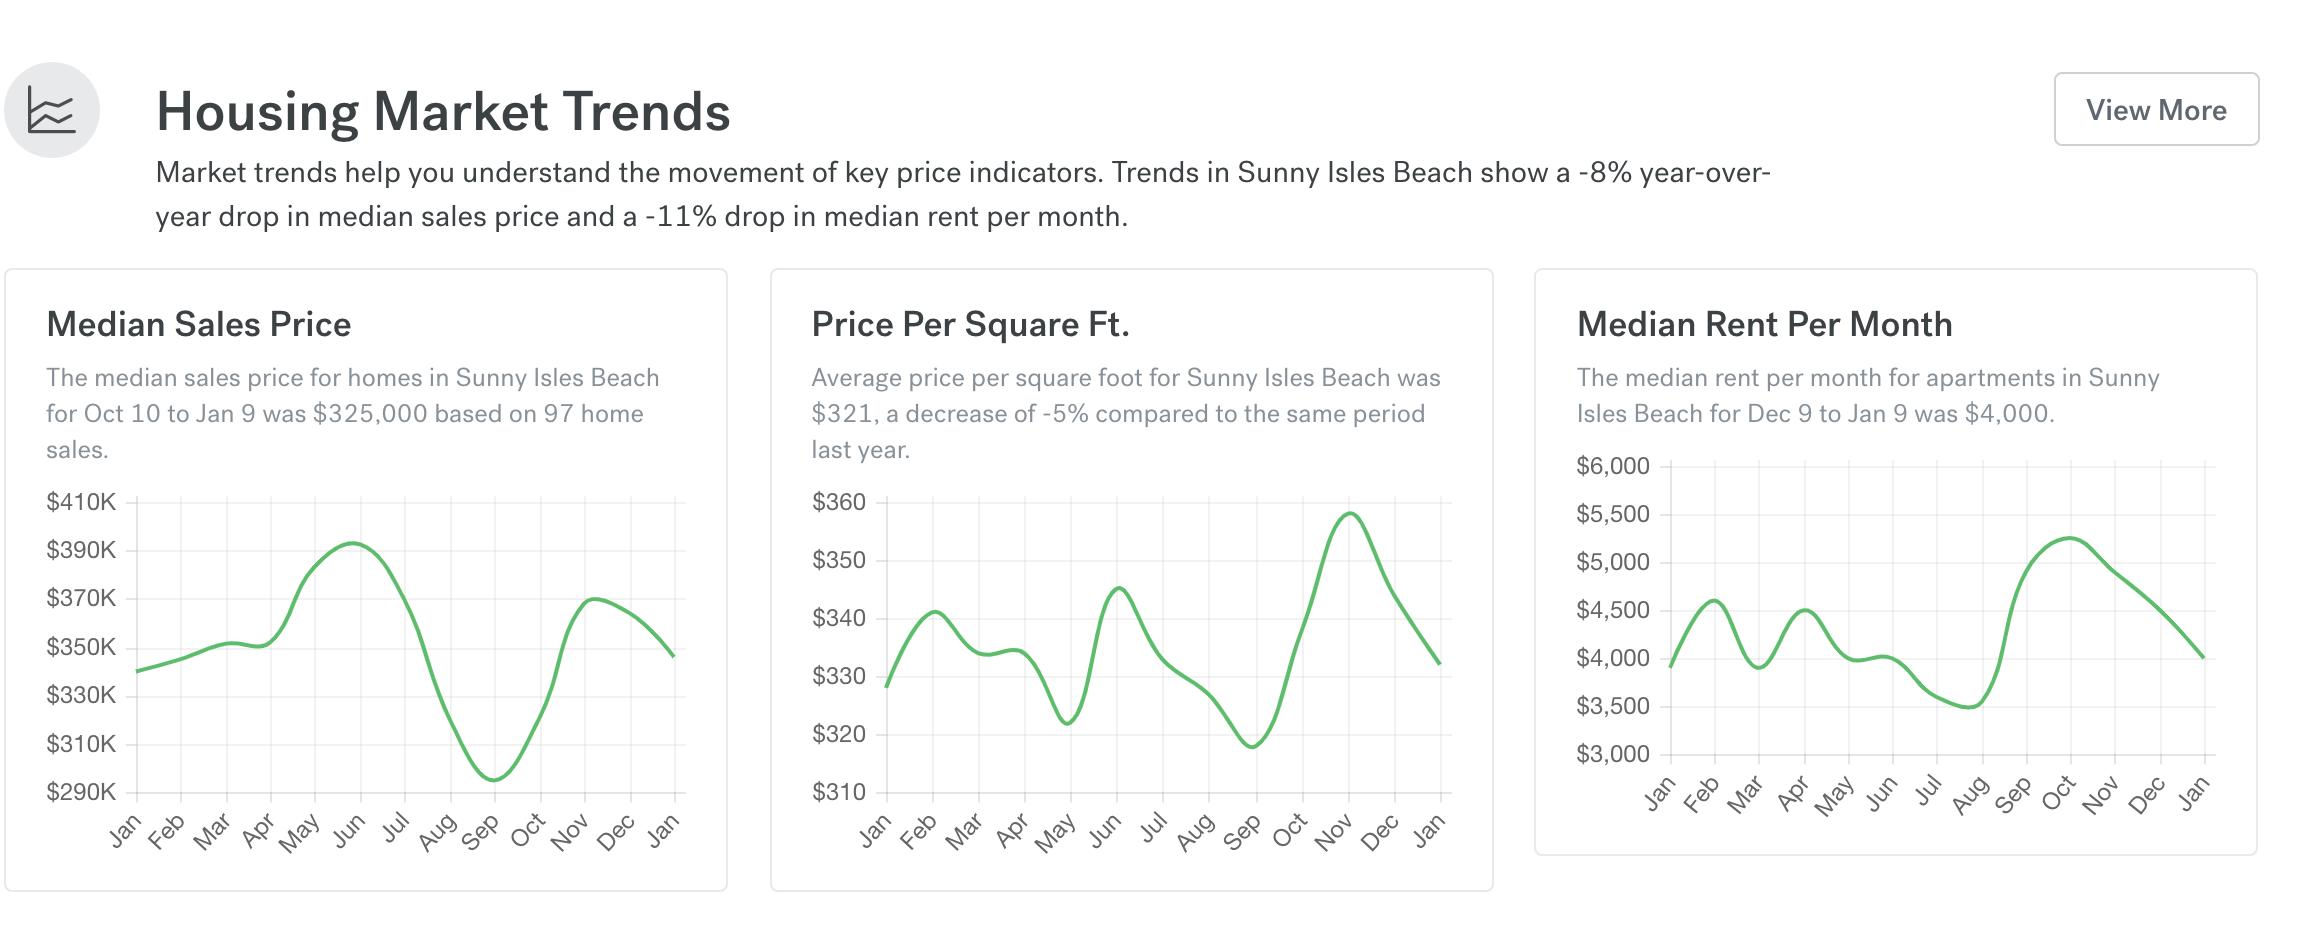 Sunny Isles Beach housing trends